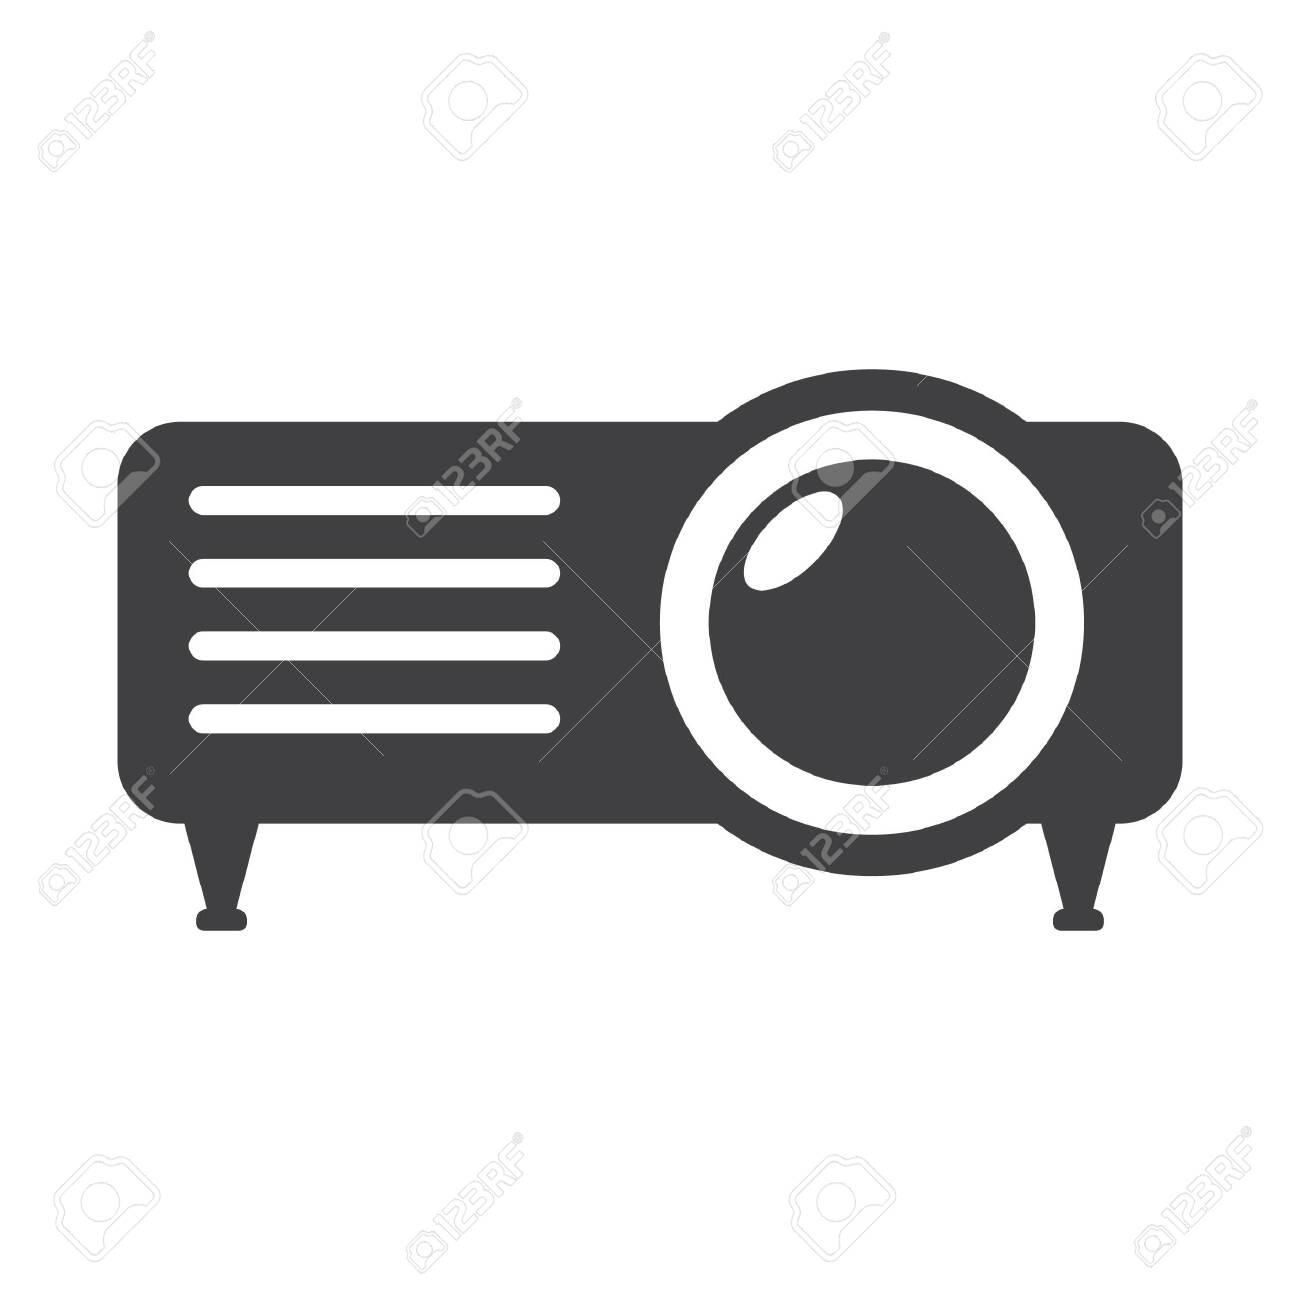 projector - 106667509